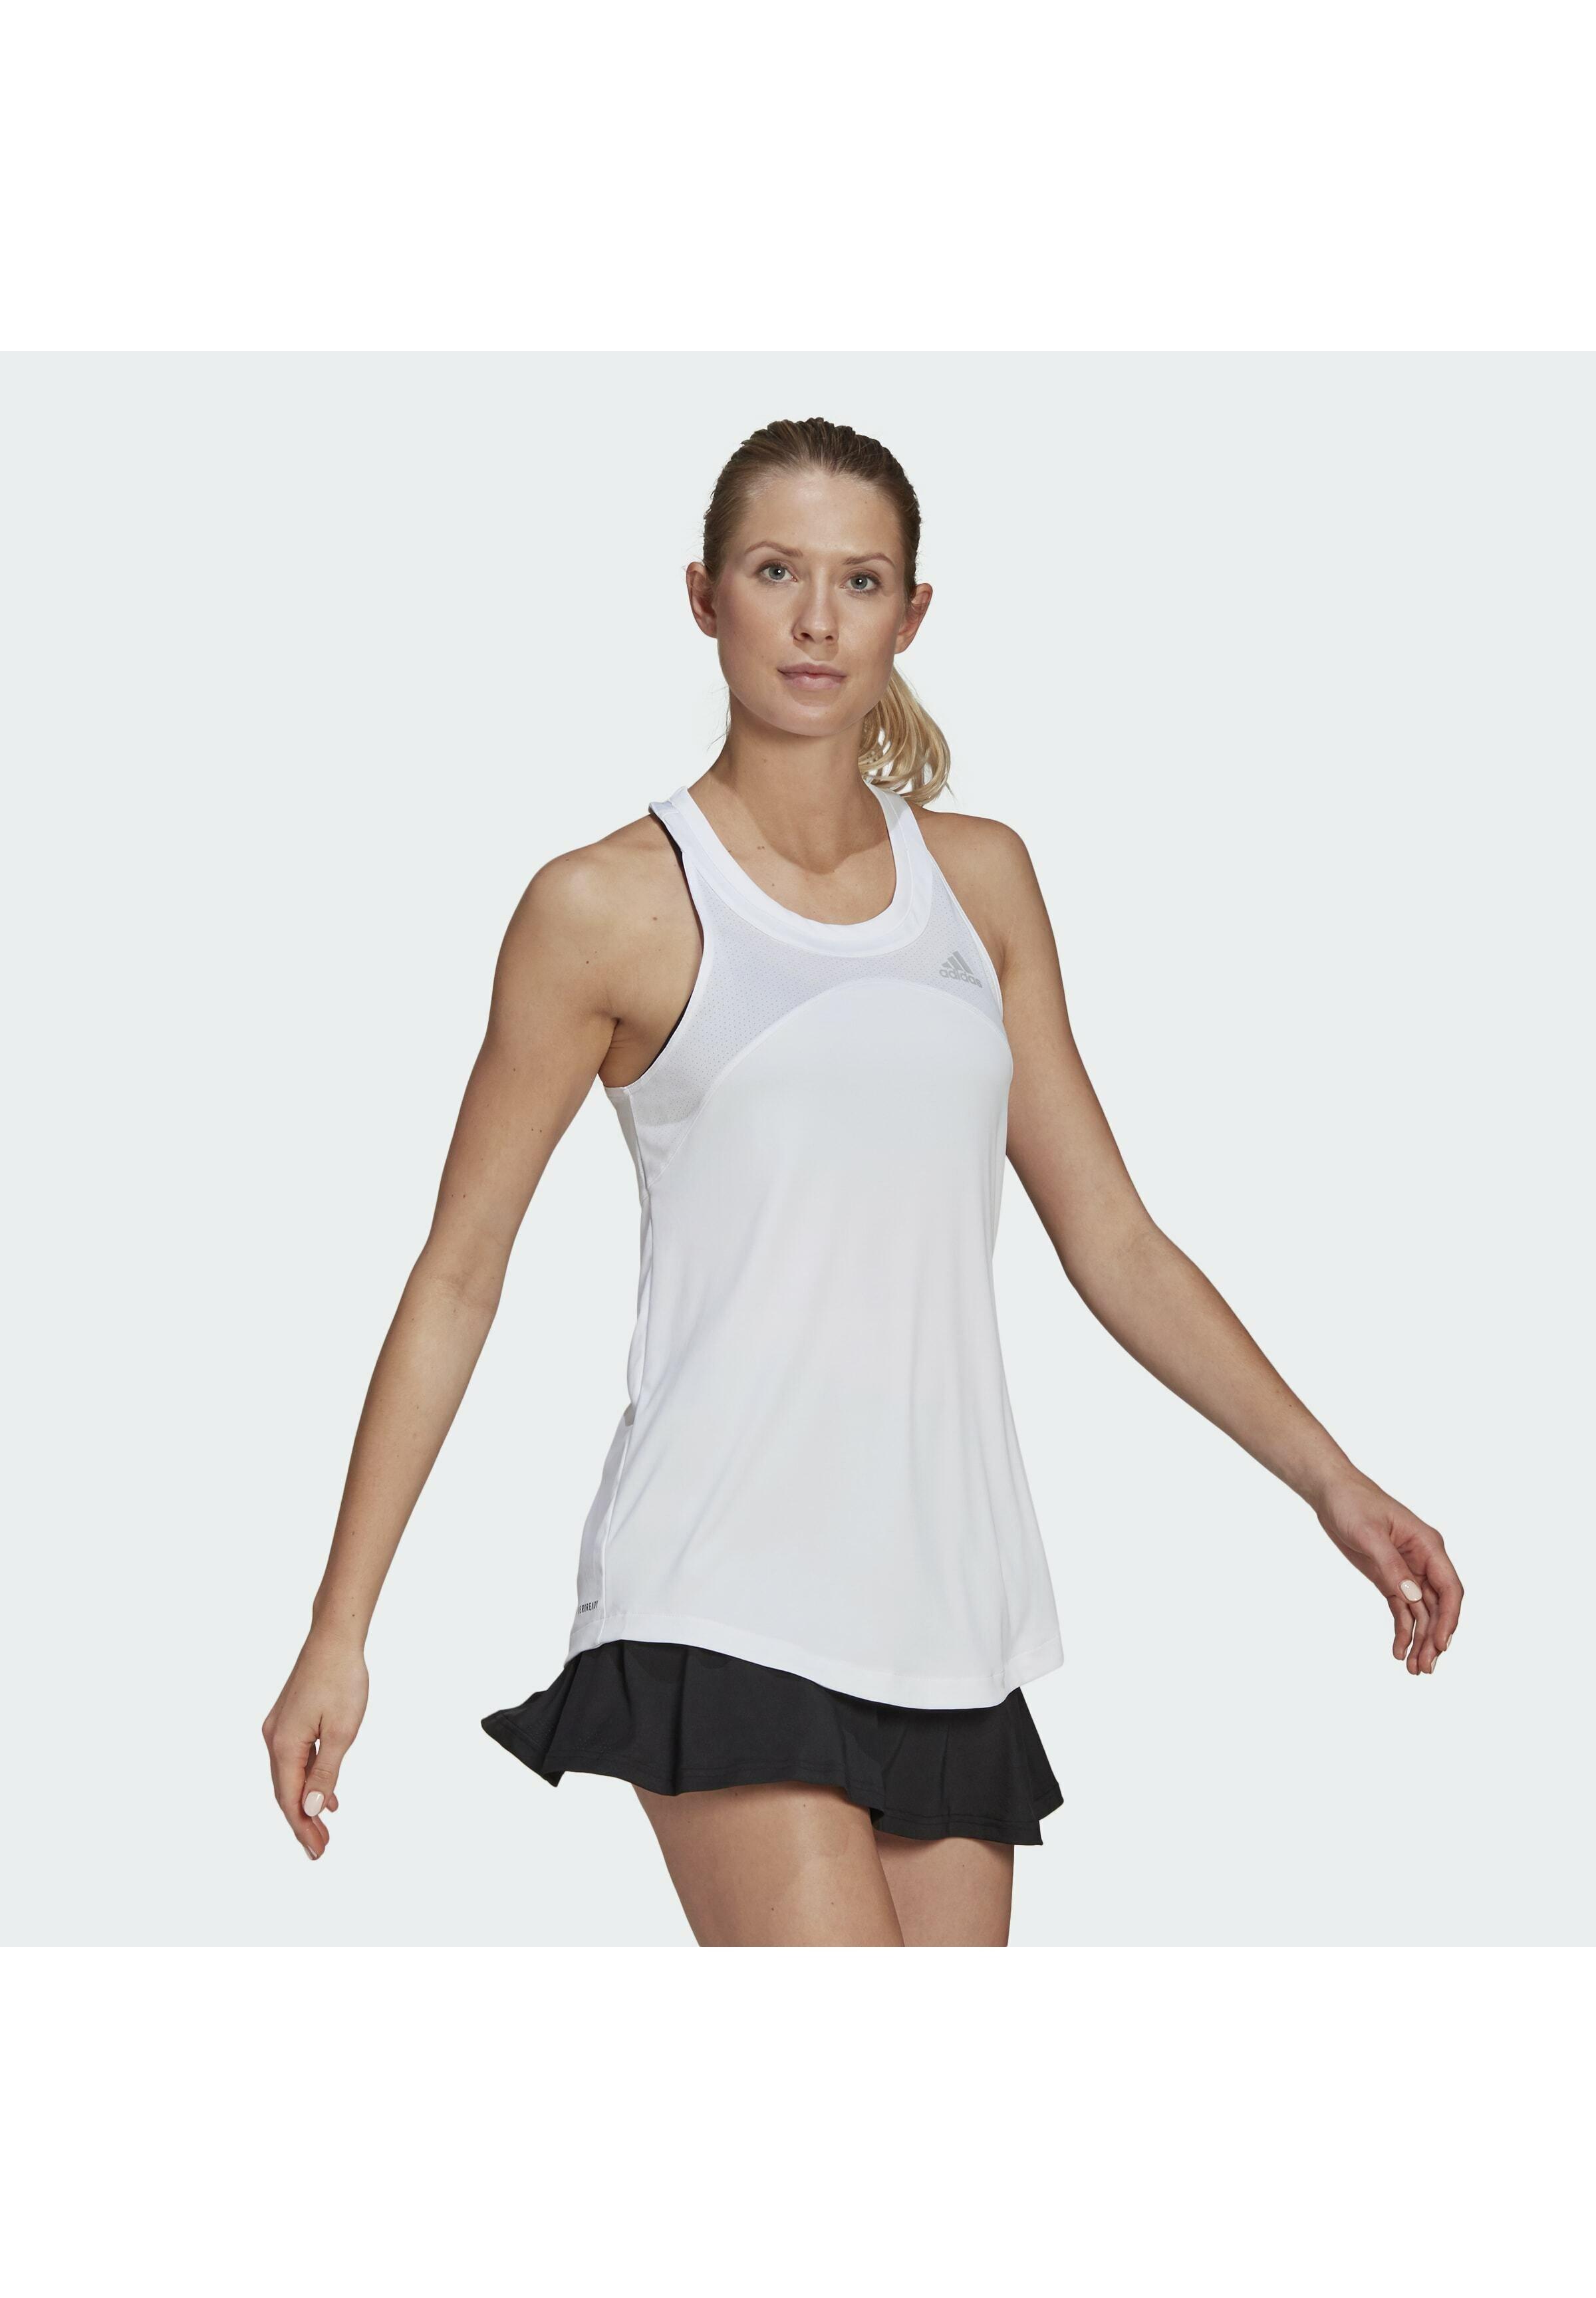 Damen CLUB TANK - Funktionsshirt - white/grey